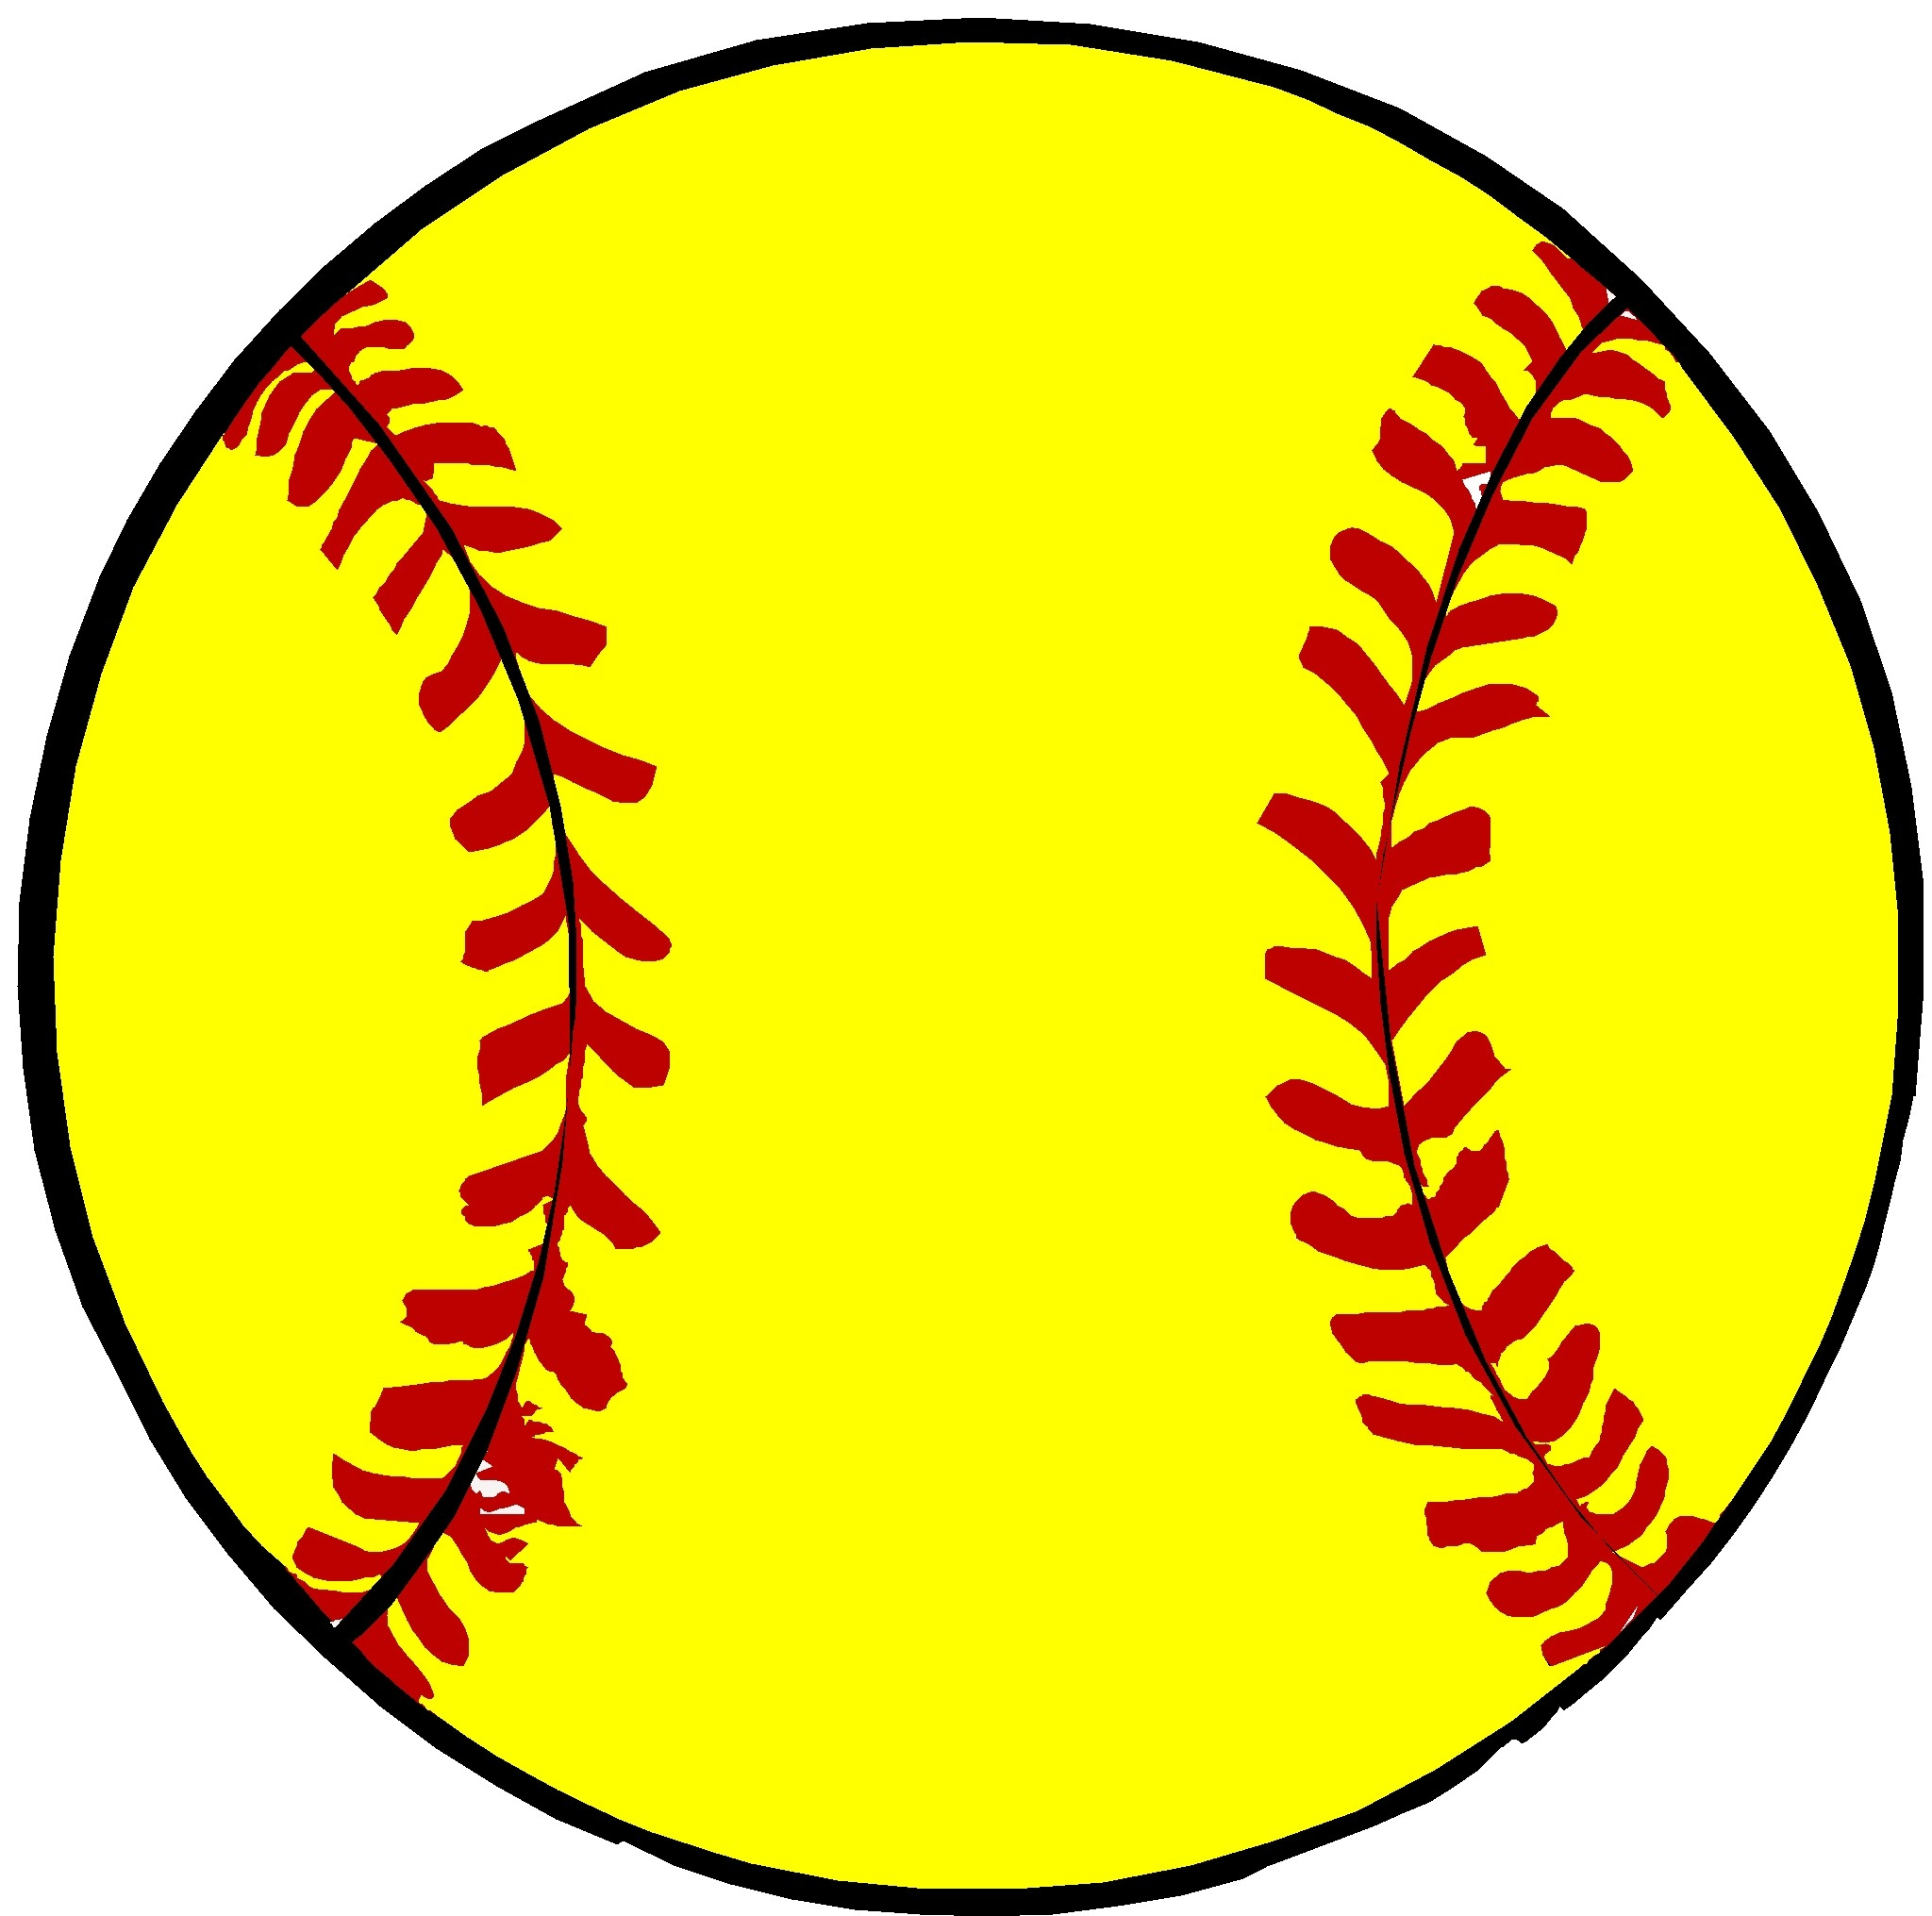 Softball birthday clipart free Free Cute Softball Cliparts, Download Free Clip Art, Free ... free